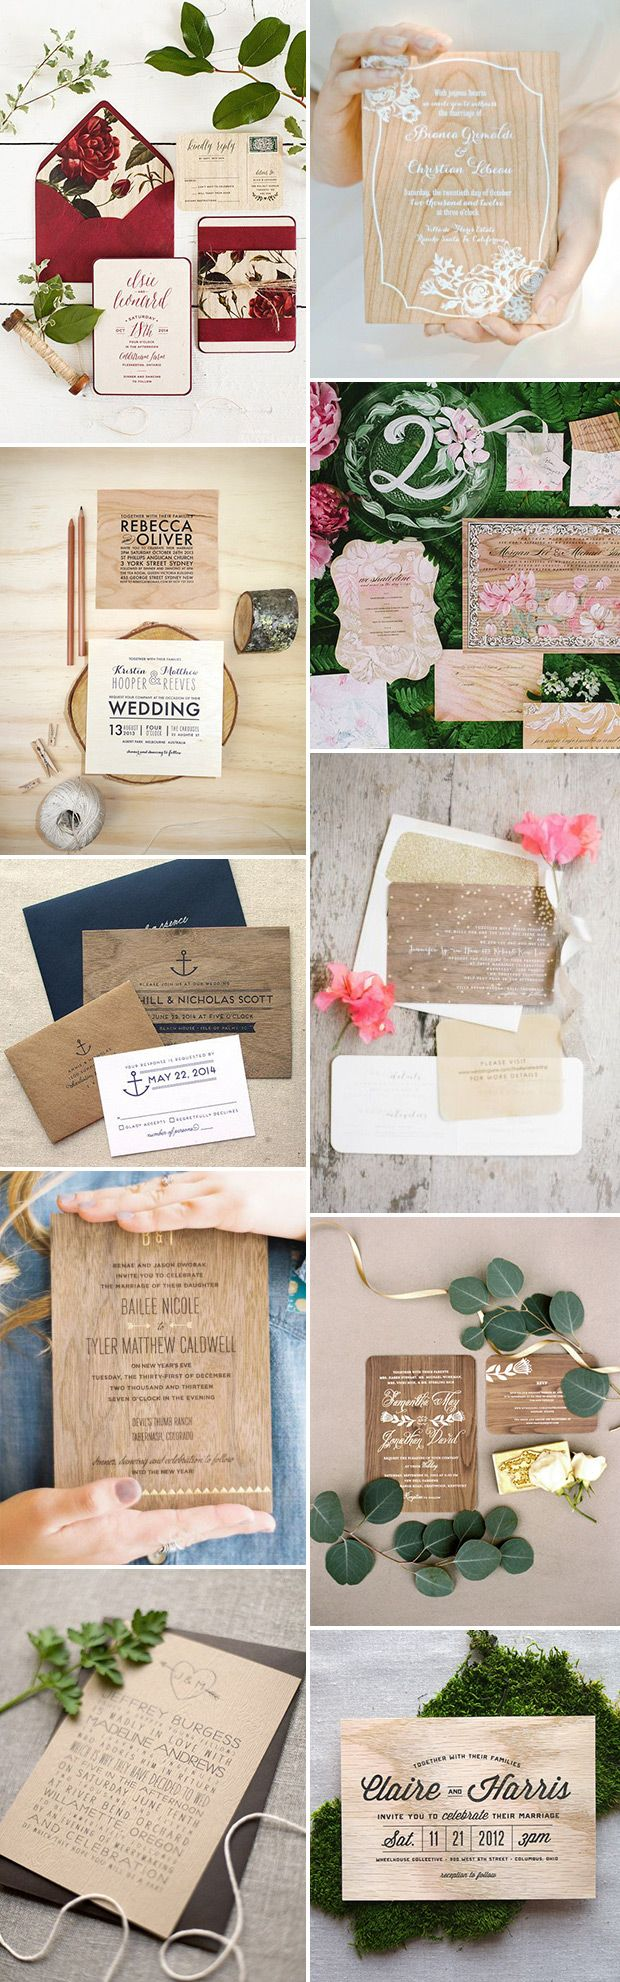 405bbba0397bd6e90459f63dab87b690 wedding invites rustic rustic style weddings best 20 wedding invitations ireland ideas on pinterest,How To Reject A Wedding Invitation